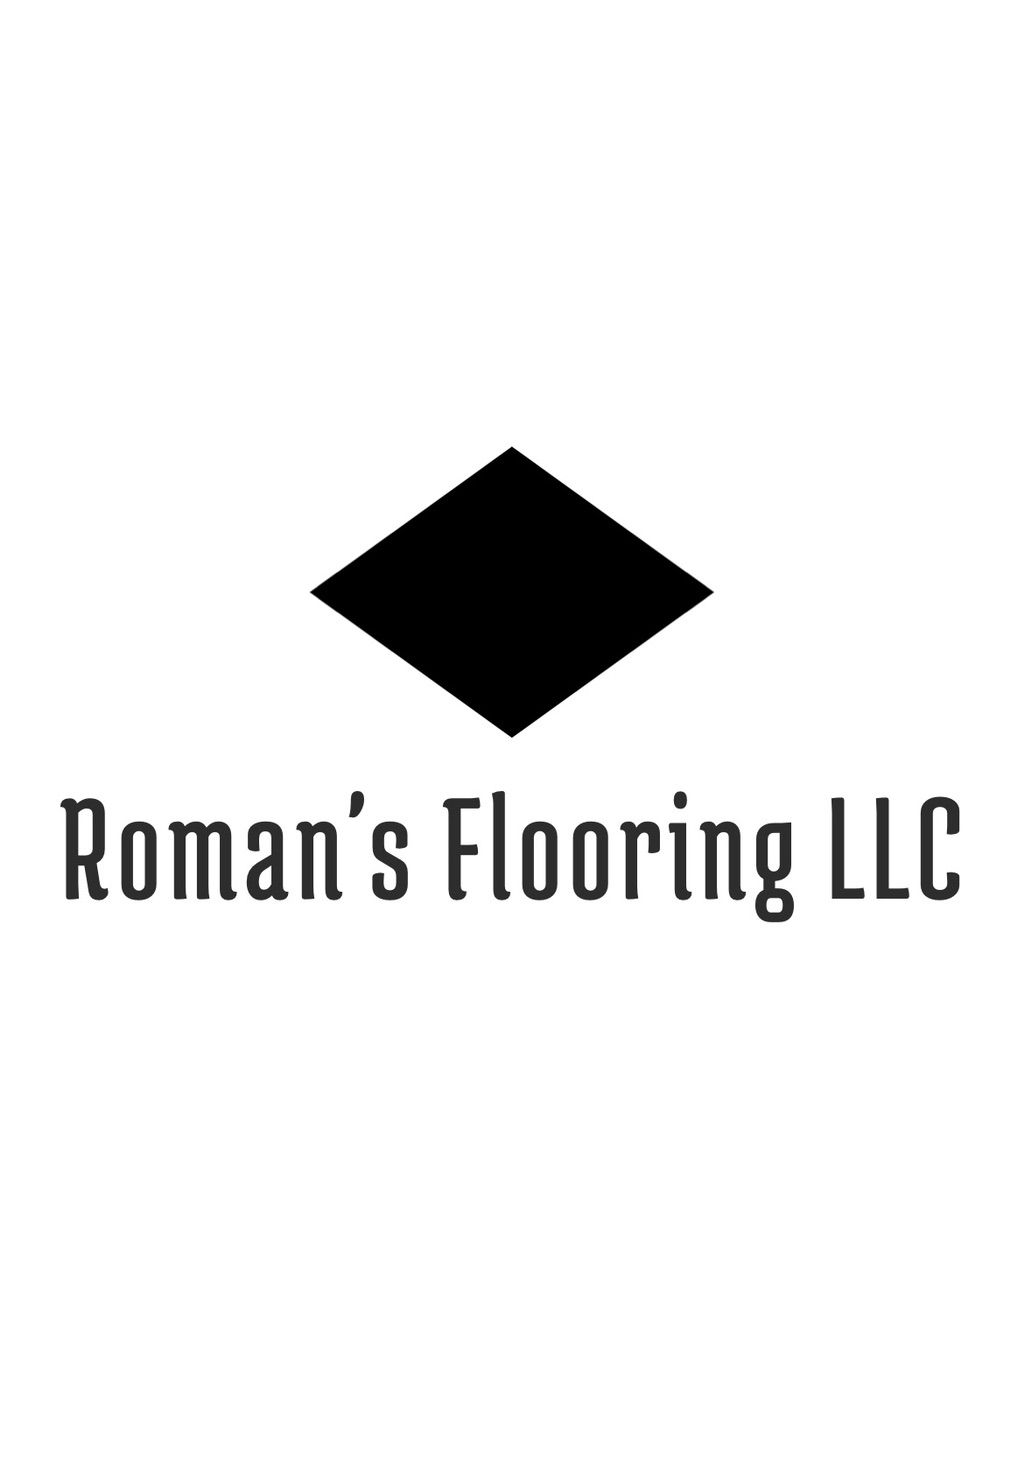 Roman's Flooring LLC